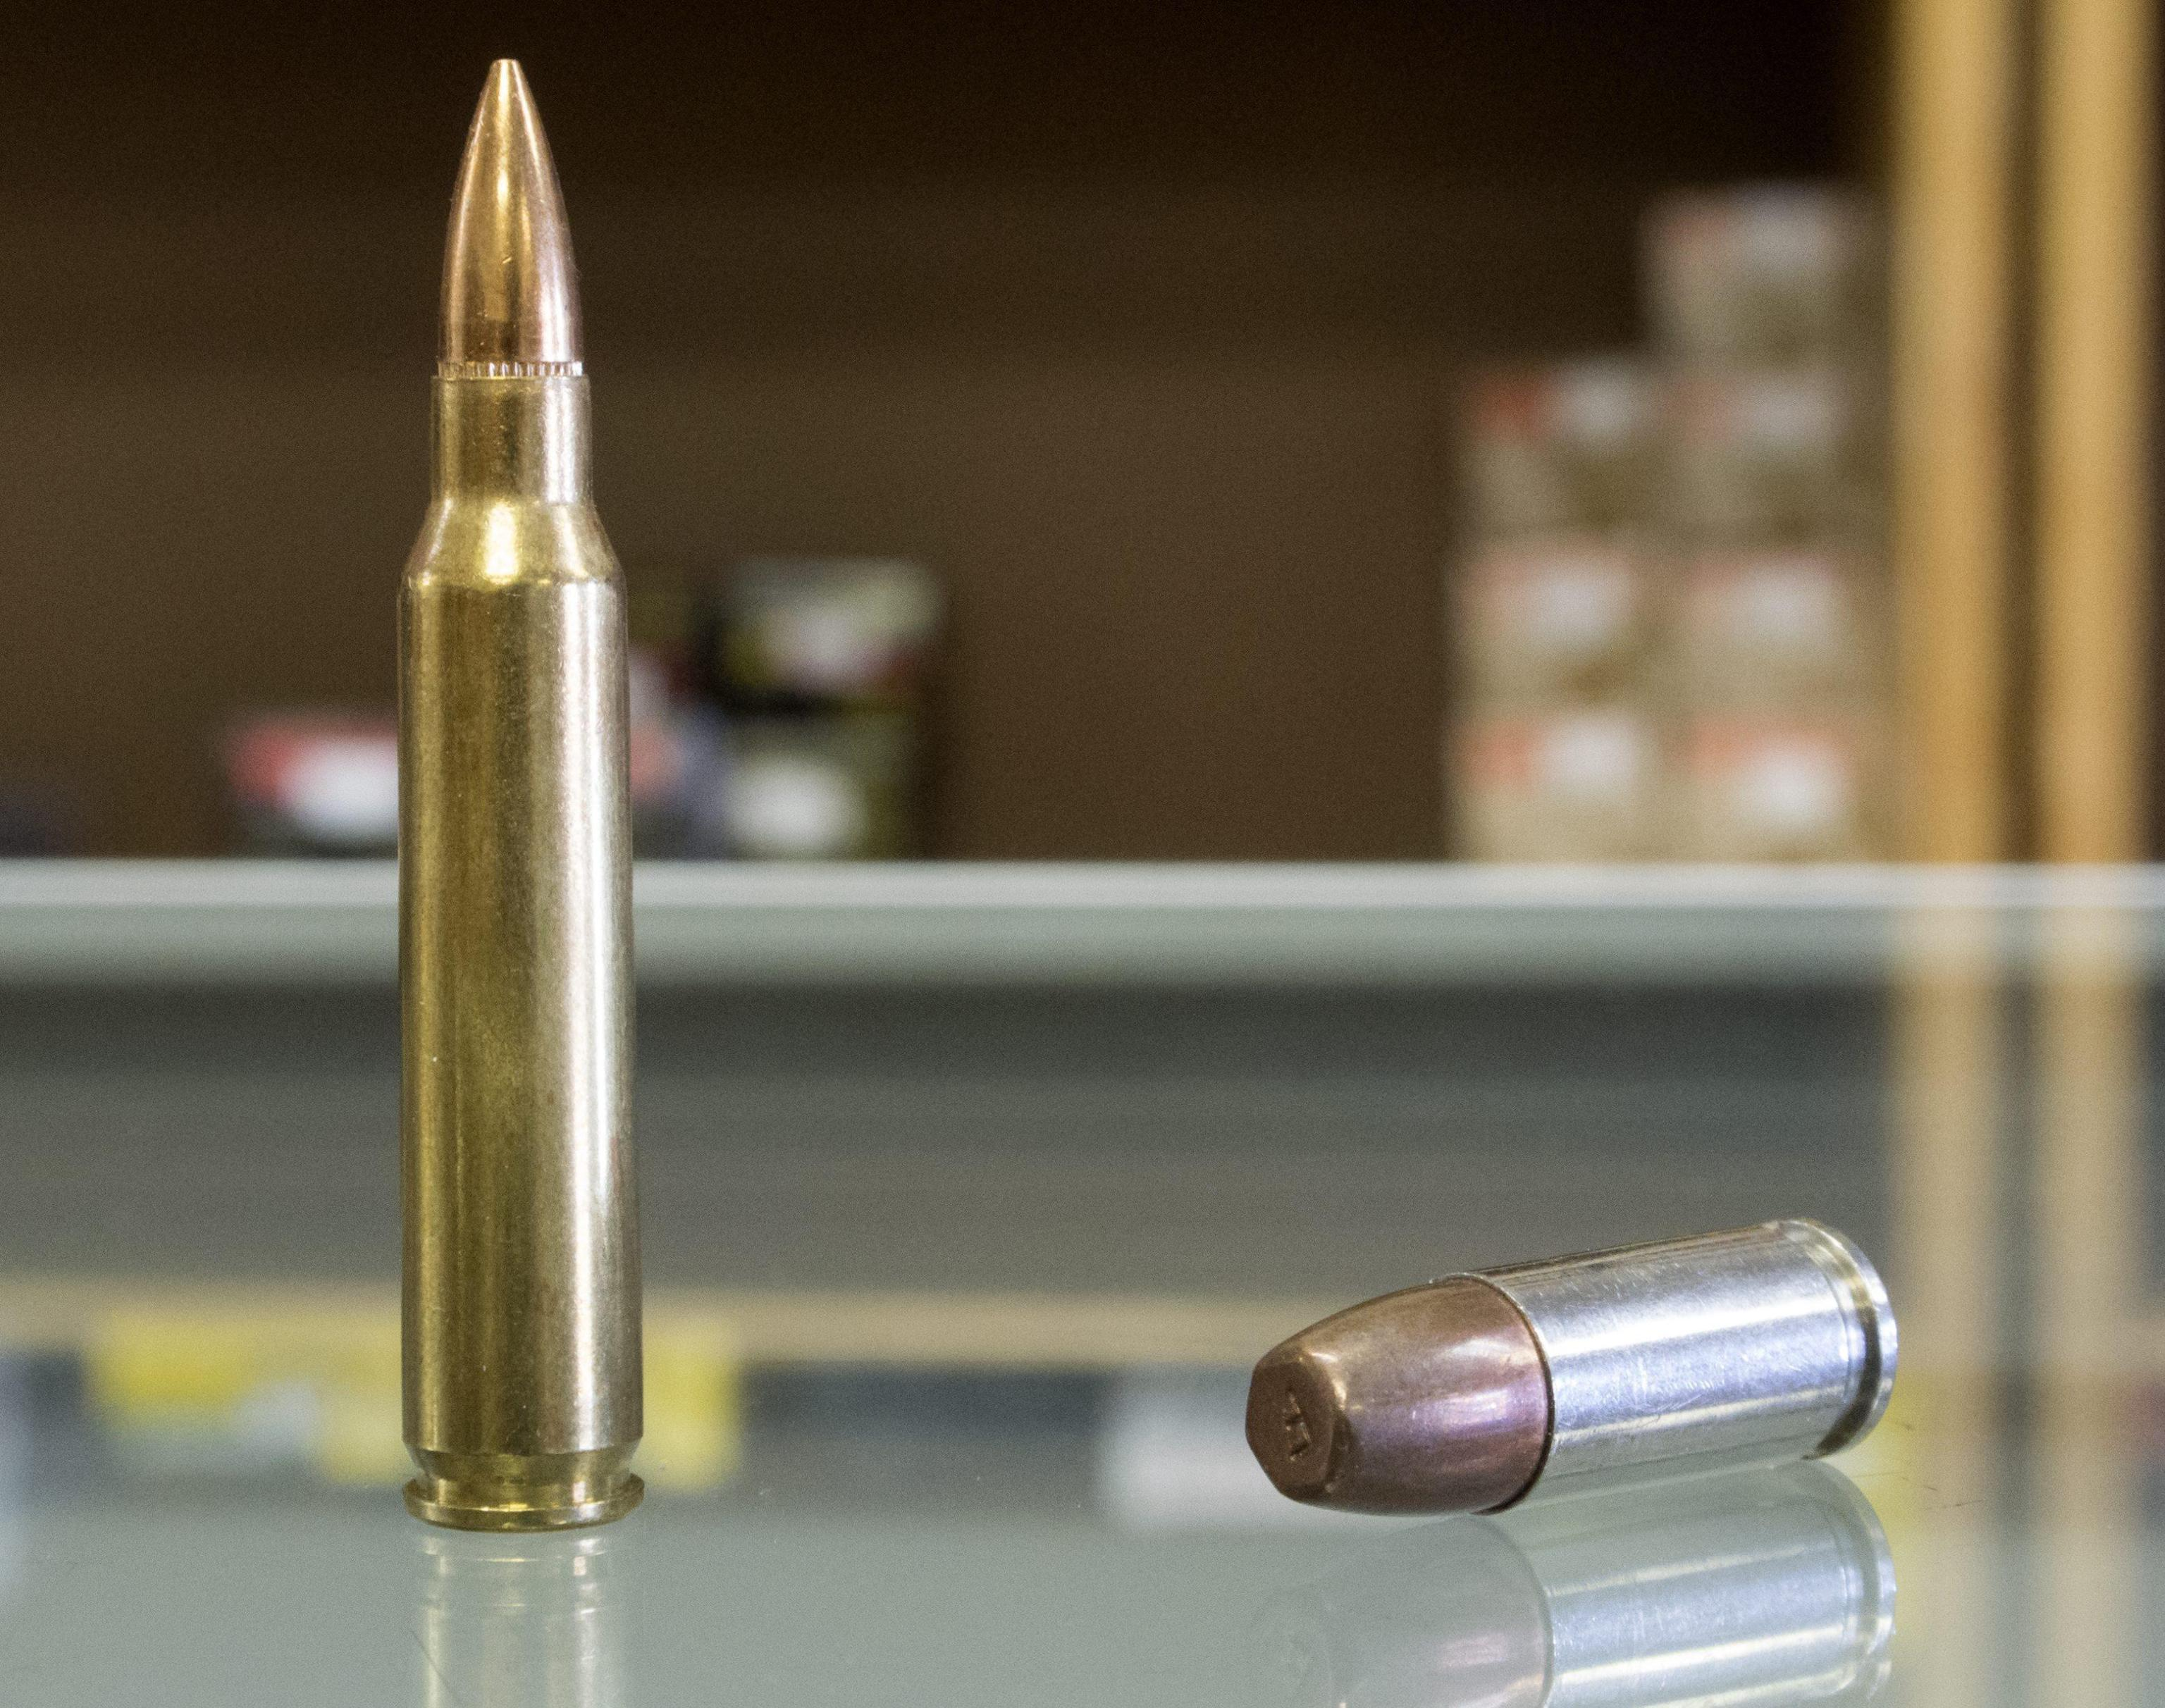 Gun shop in wake of Connecticut school shooting